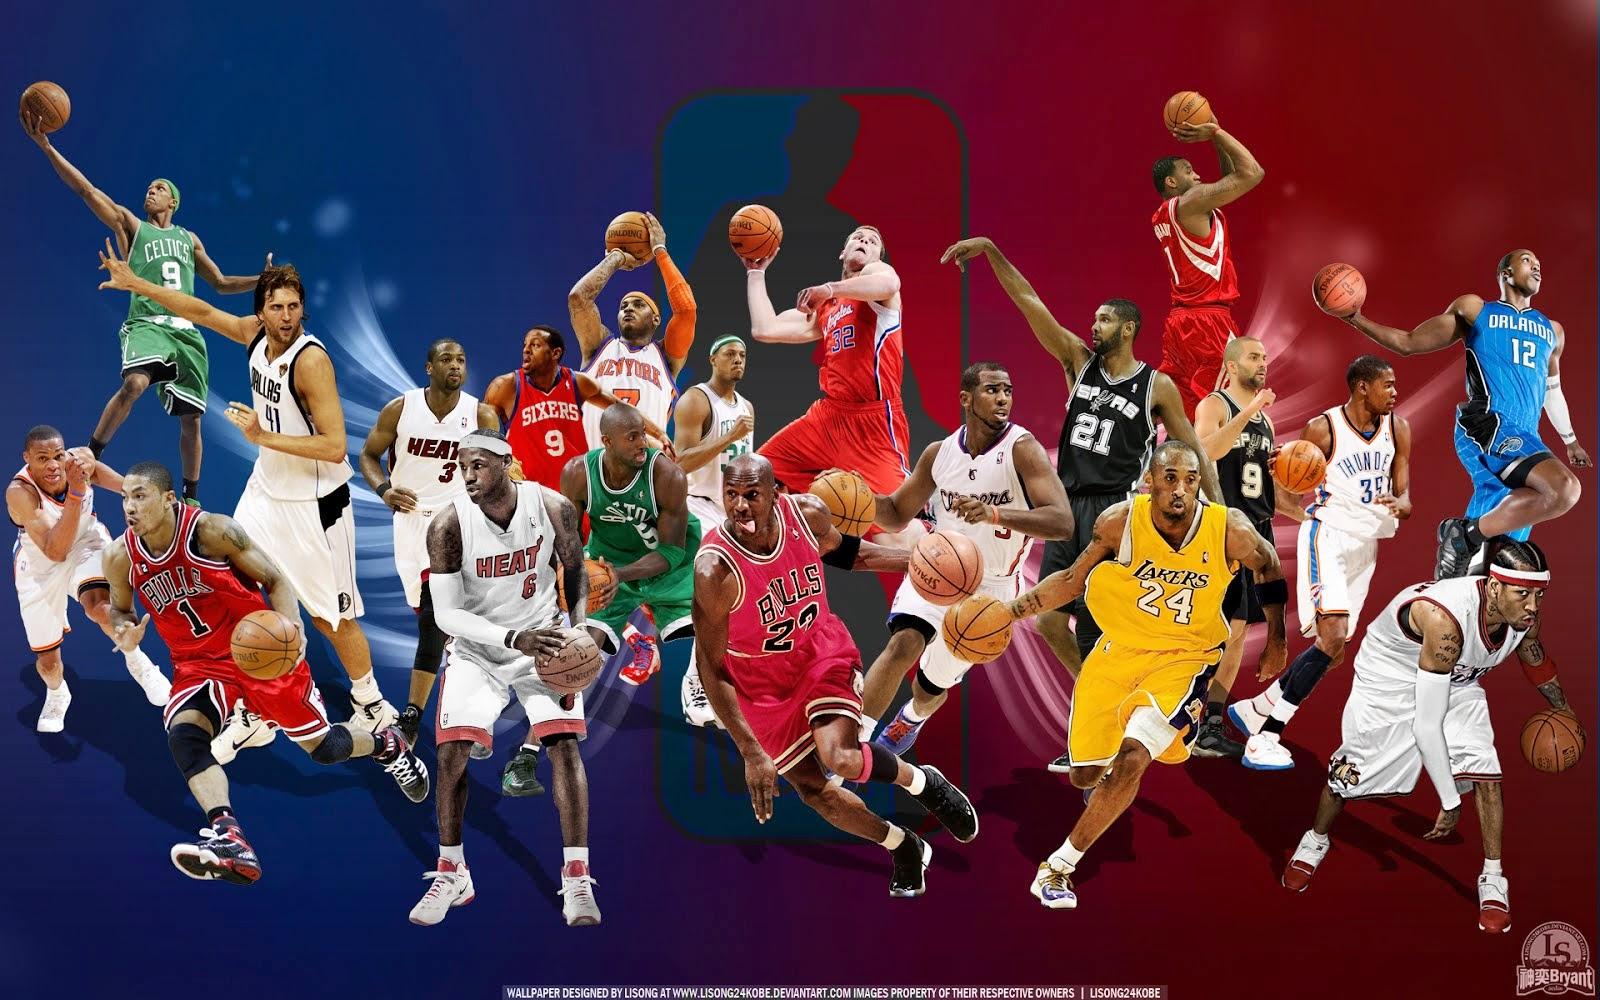 basketball stars picture nba all star wallpaper